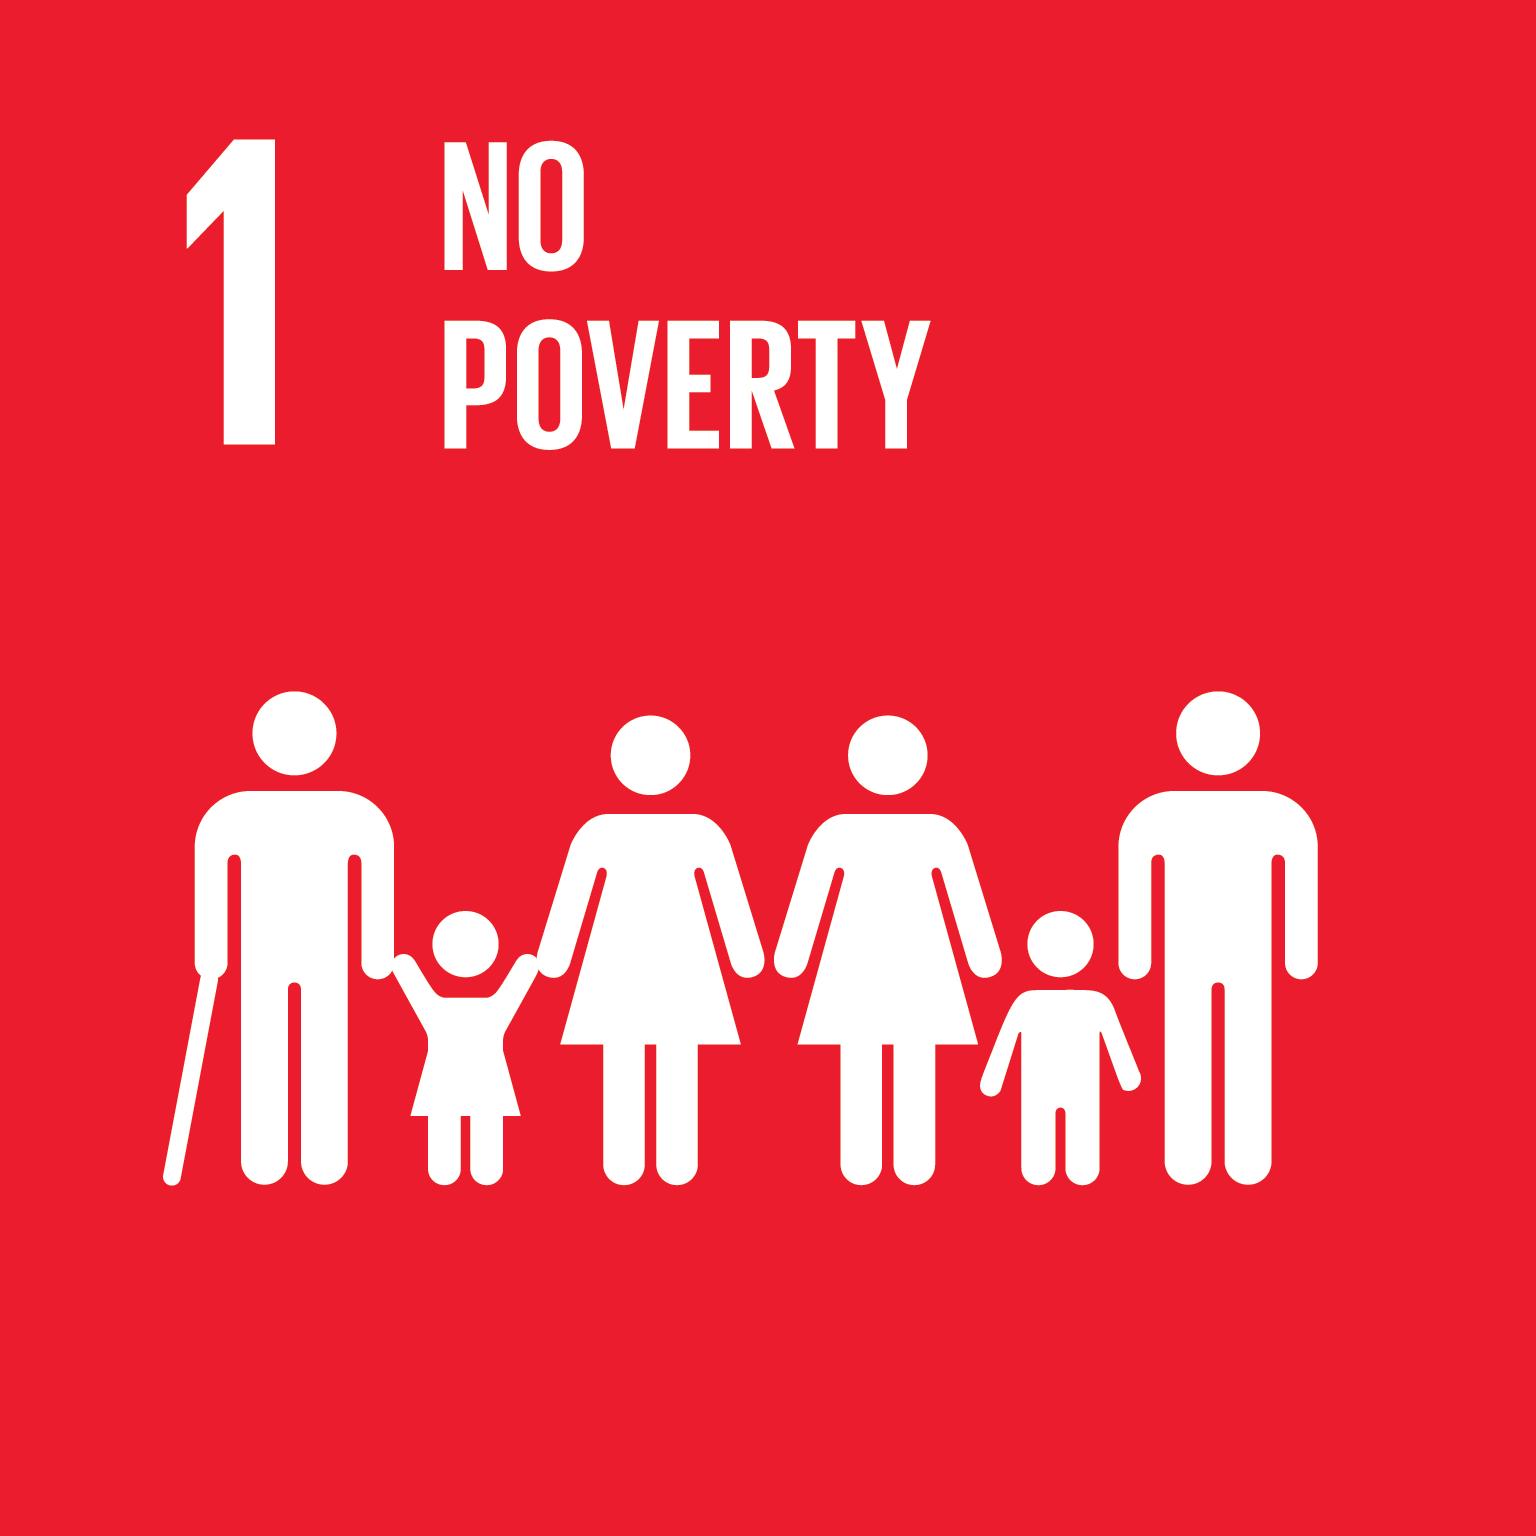 Goal 1 No Poverty